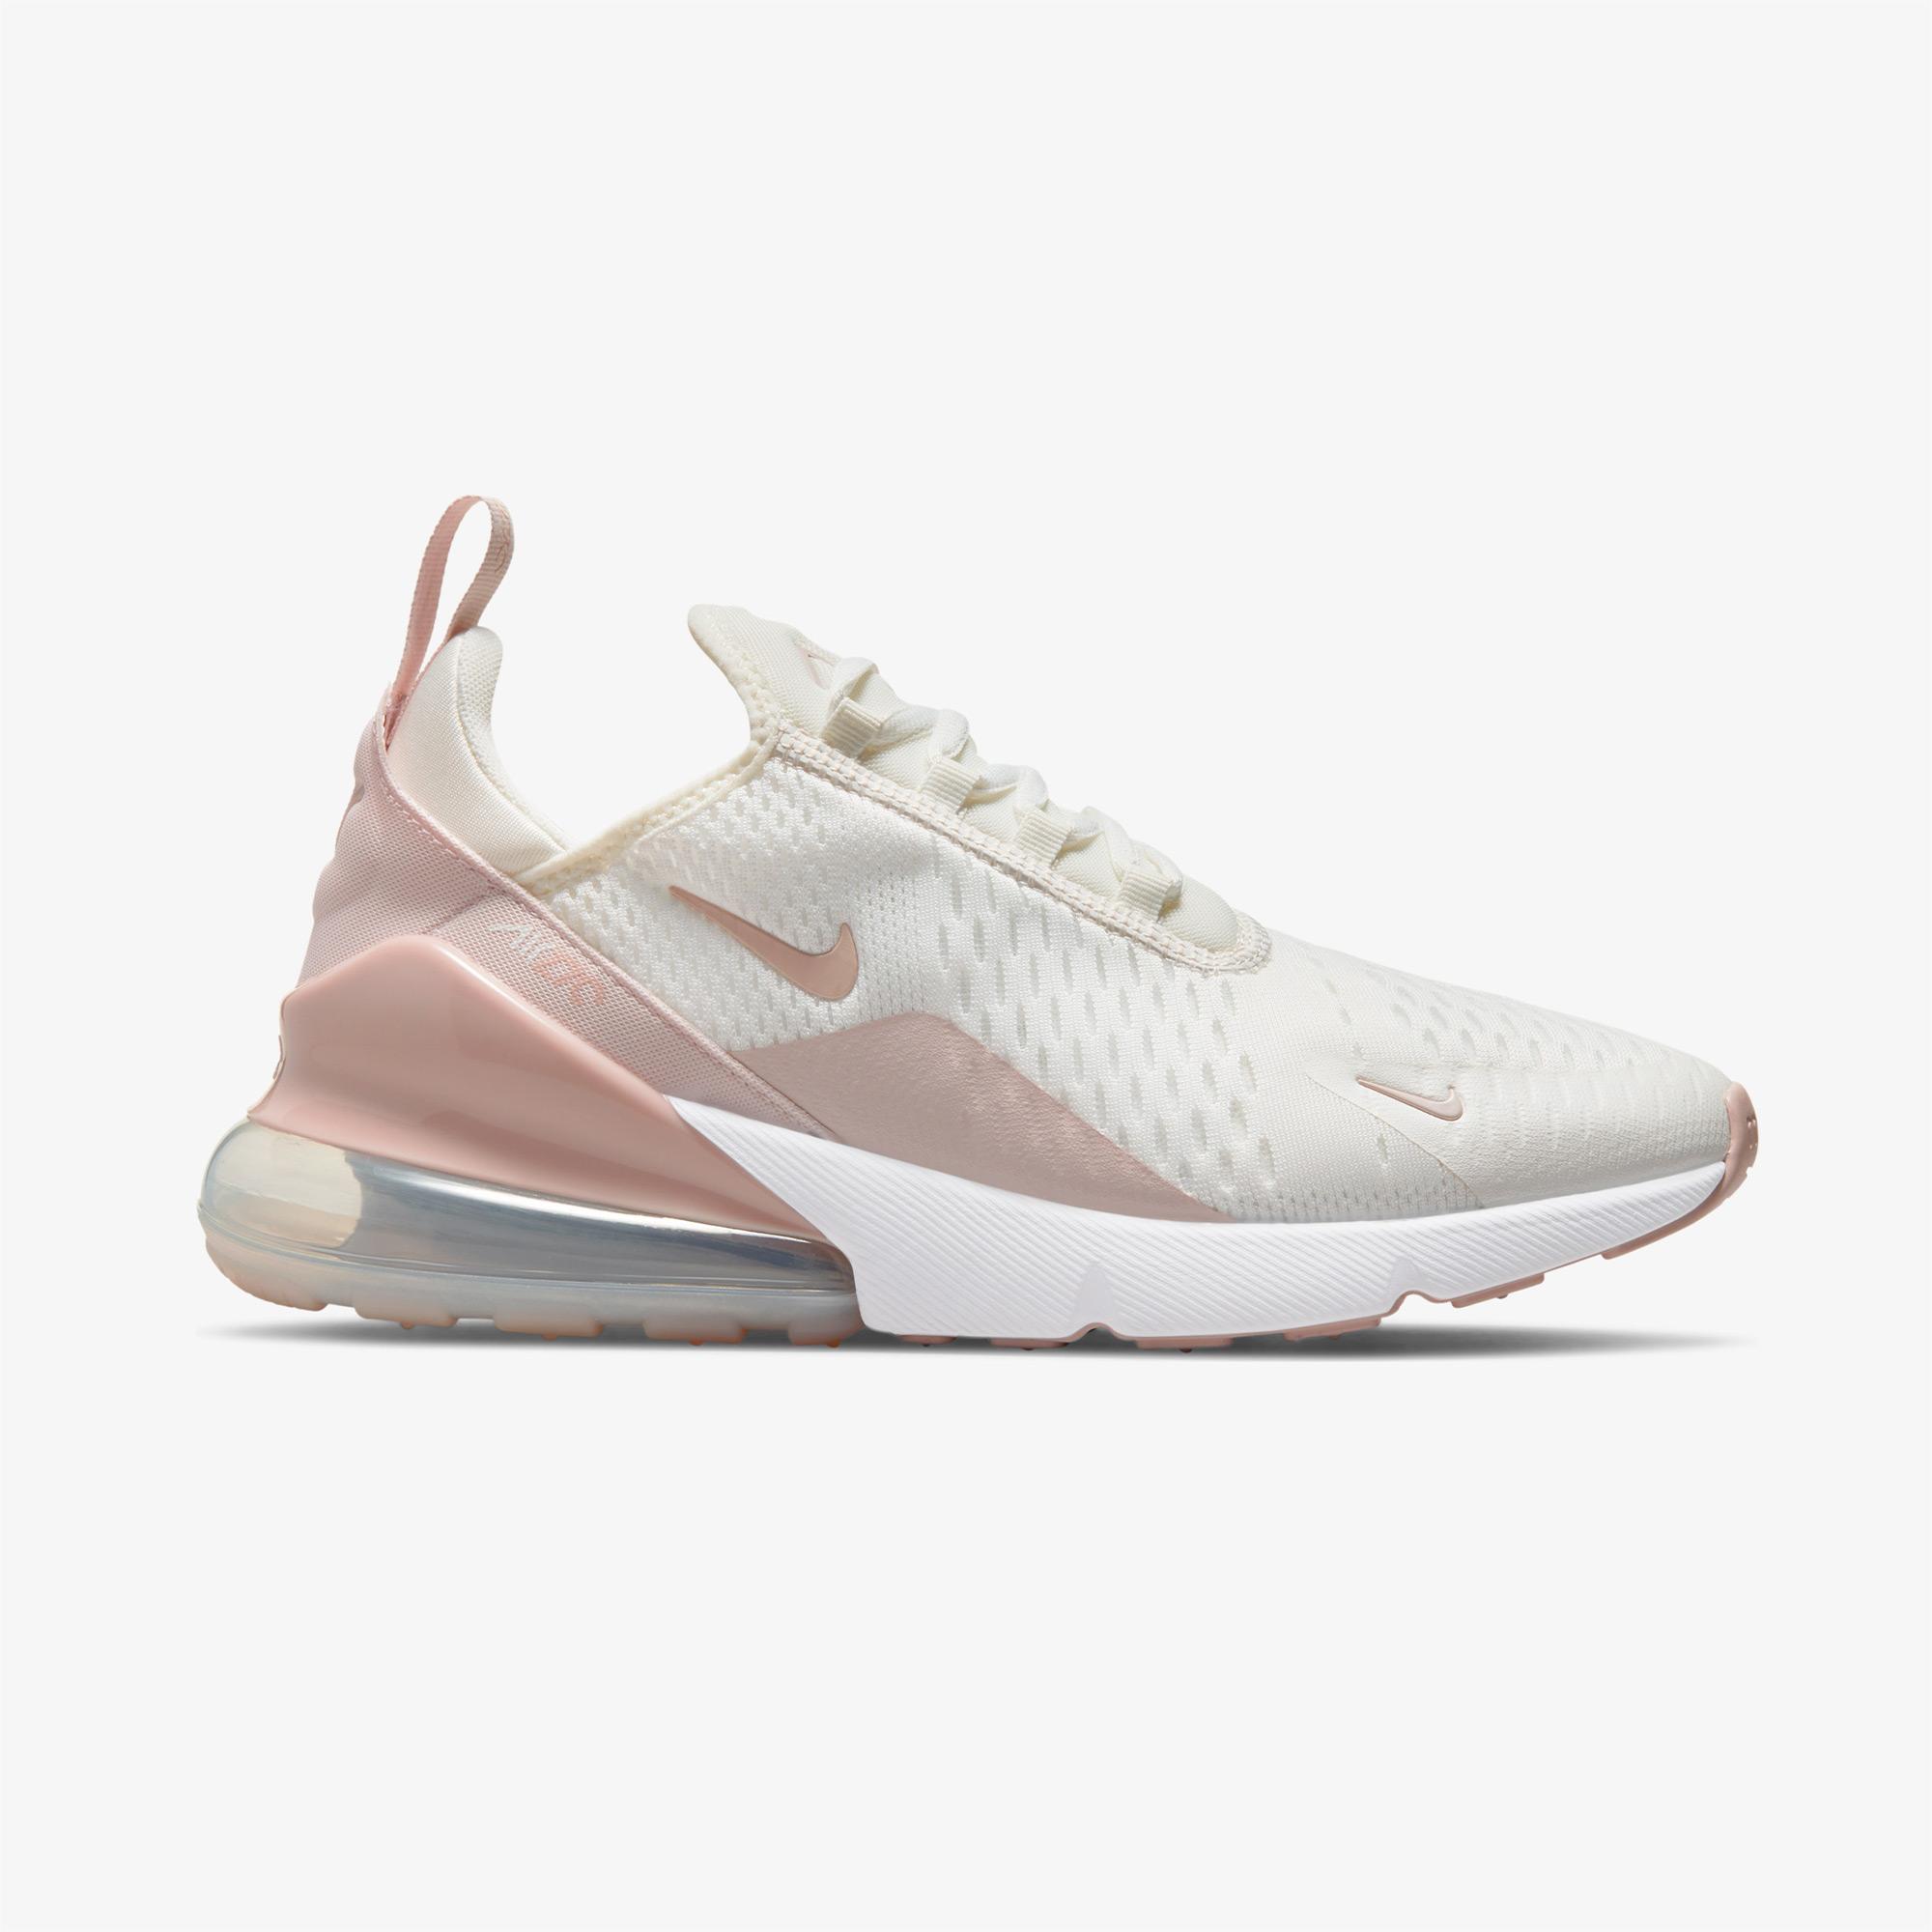 Nike Air Max 270 Essentials Kadın Beyaz Spor Ayakkabı